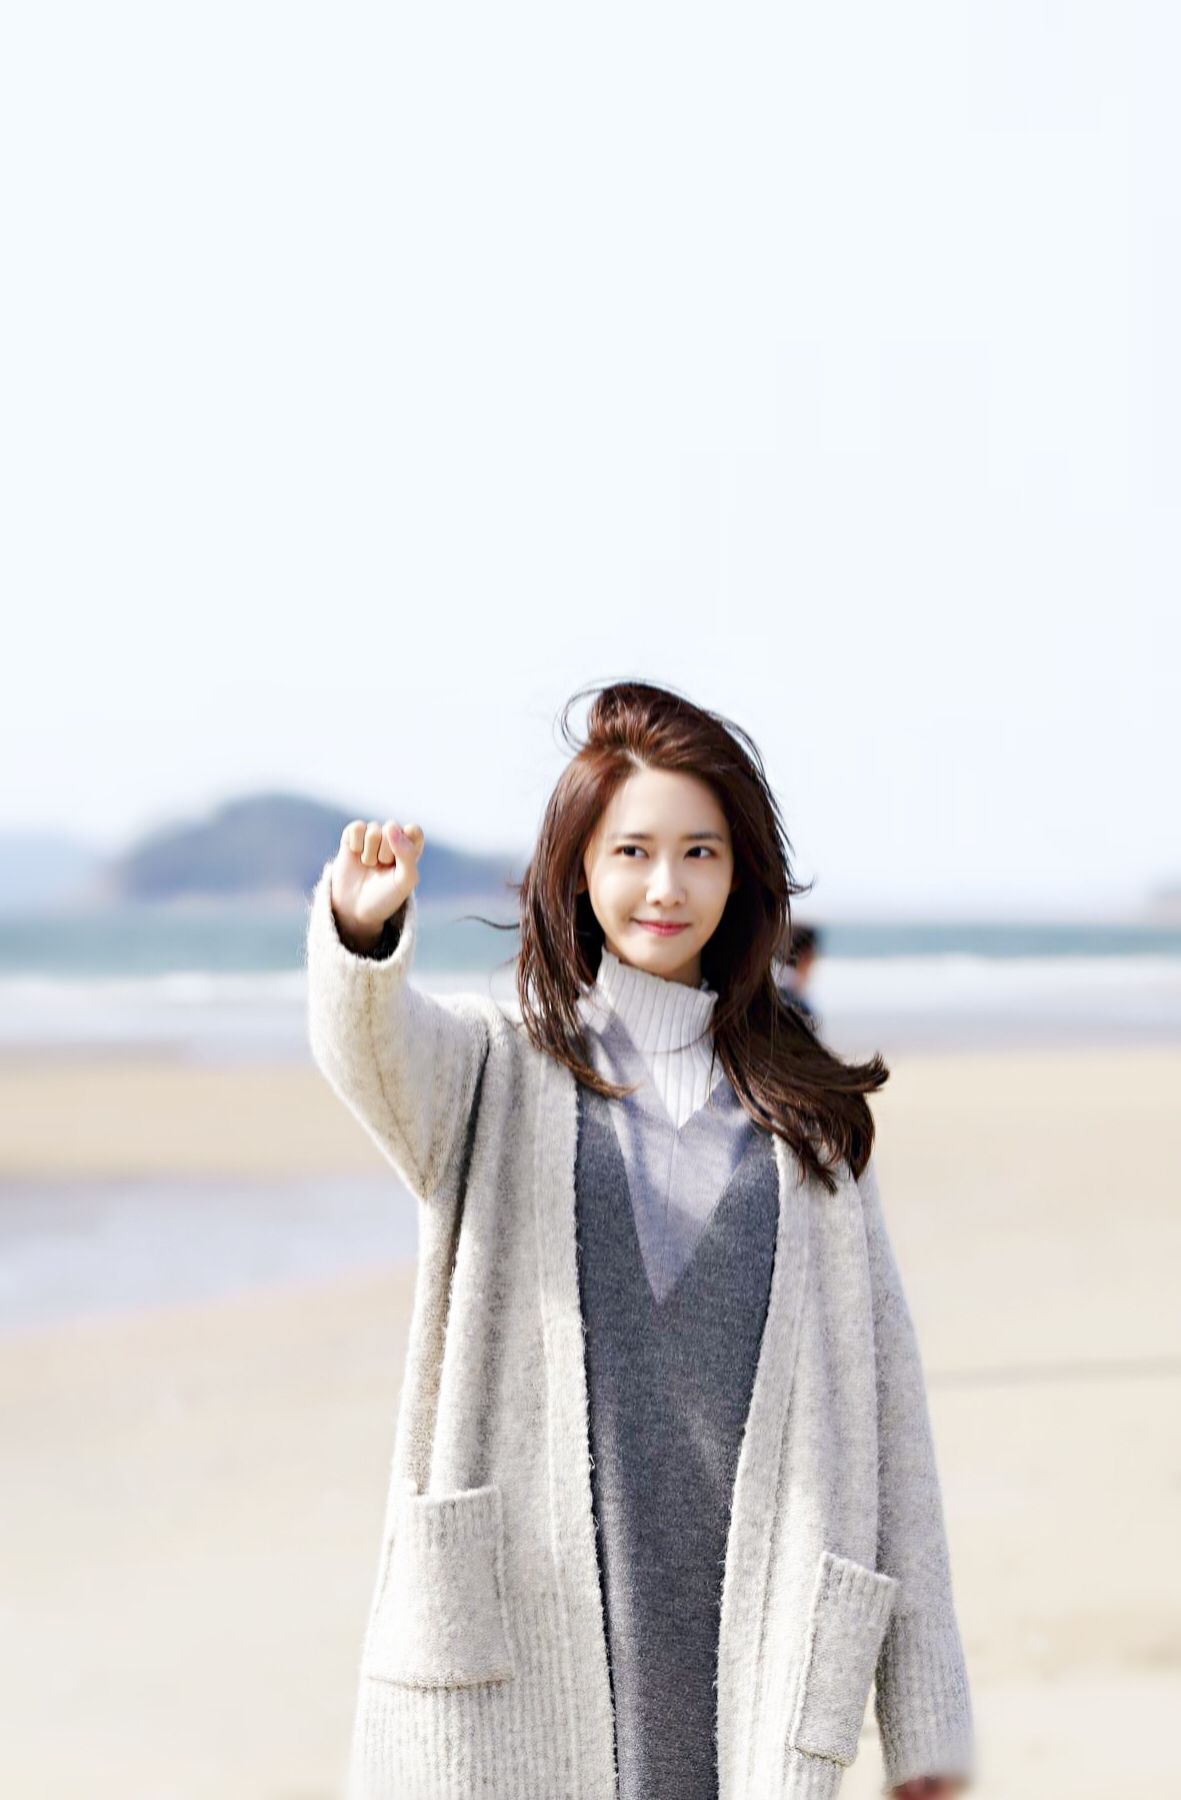 The K2 Snsd Yoona Iphone Wallpaper Lockscreen Girls Generation Selebriti Aktris